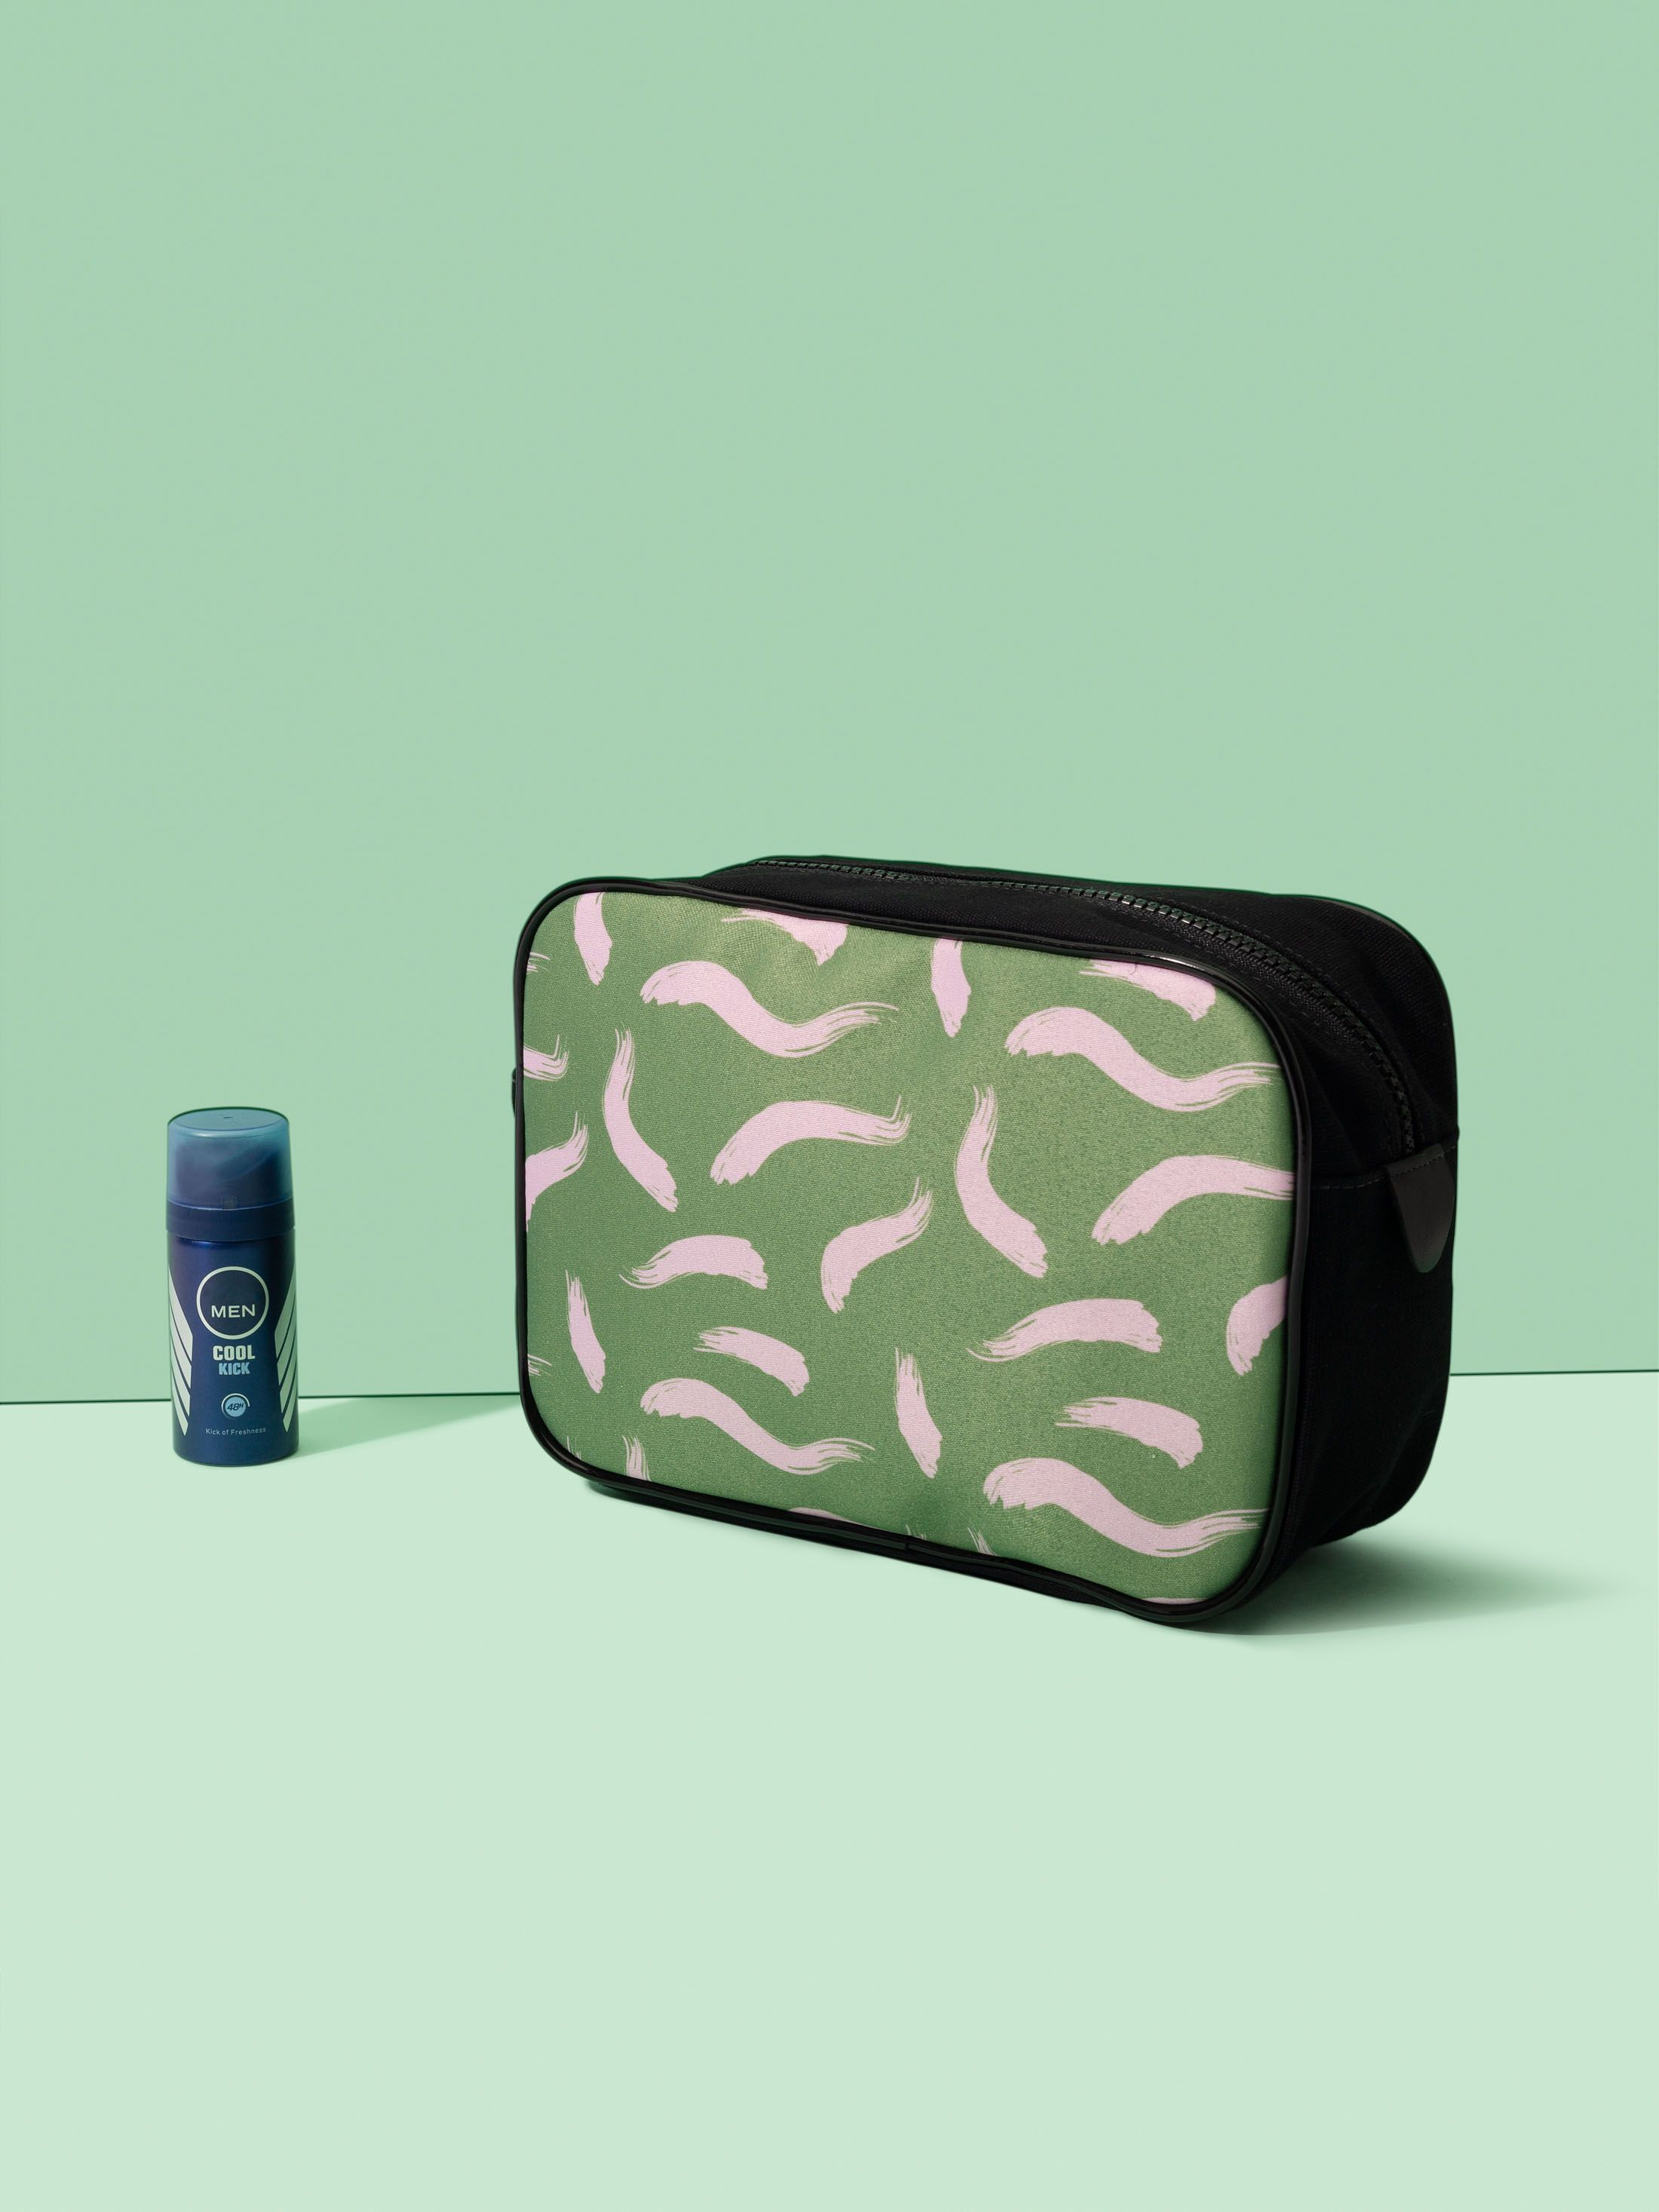 bolsa de aseo personalizada detalle impresion